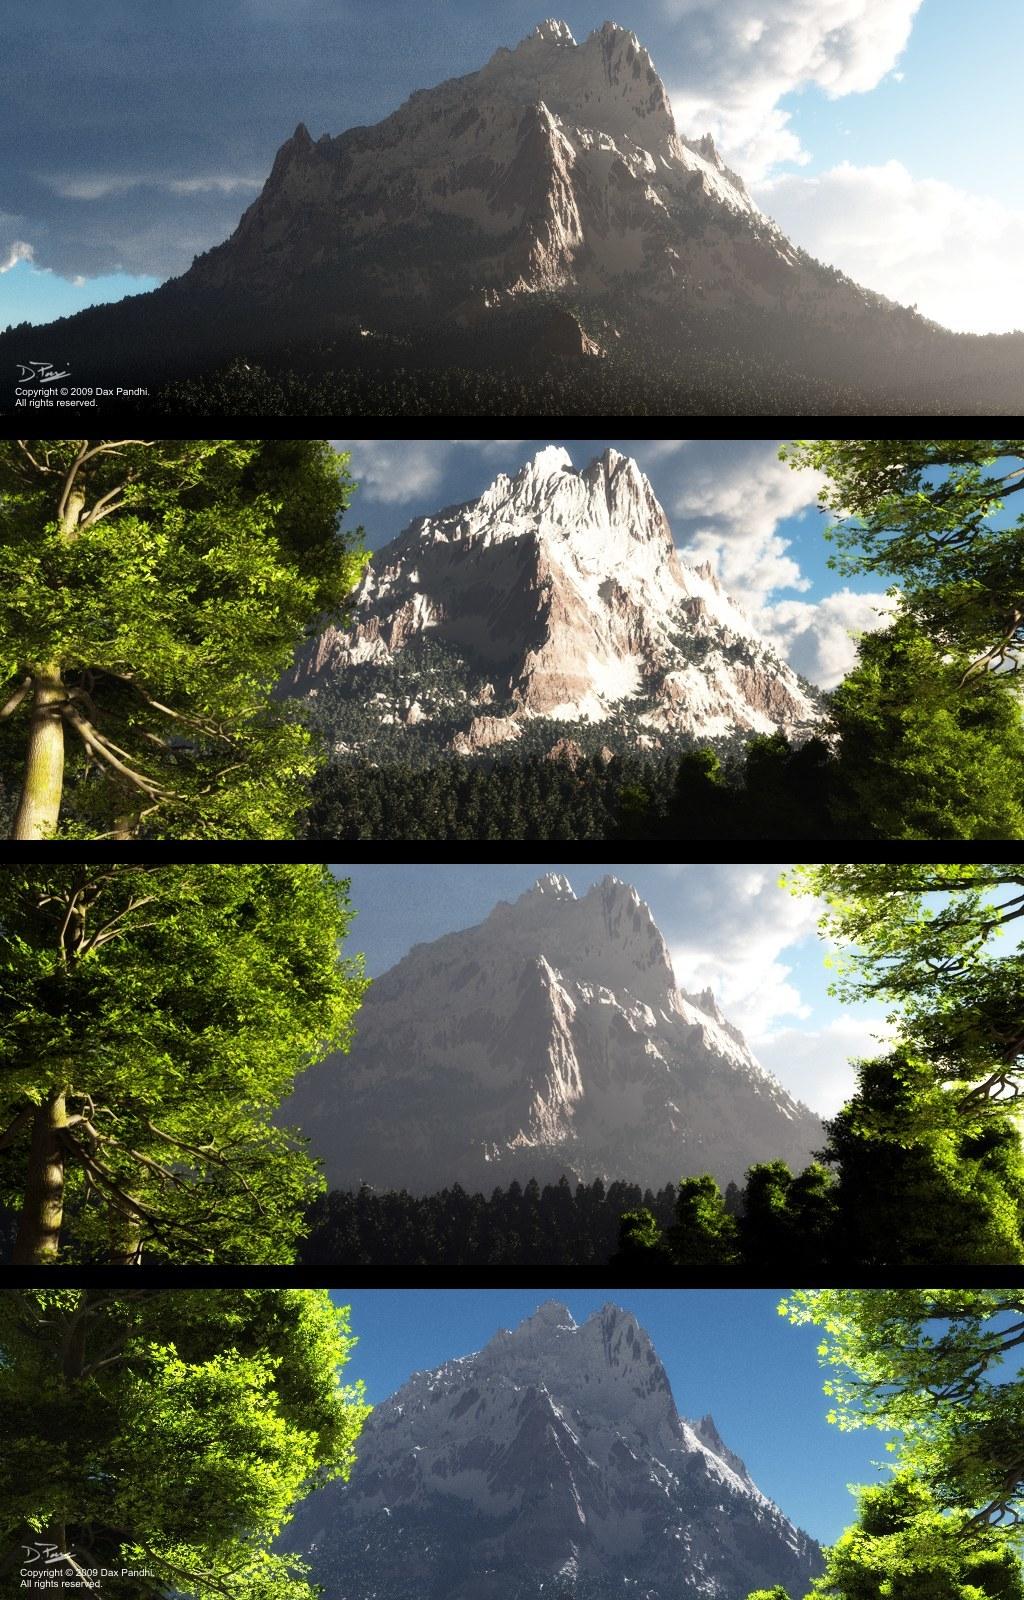 Quadspinner talon peak a mountai 1 ad0e8634 z2pt